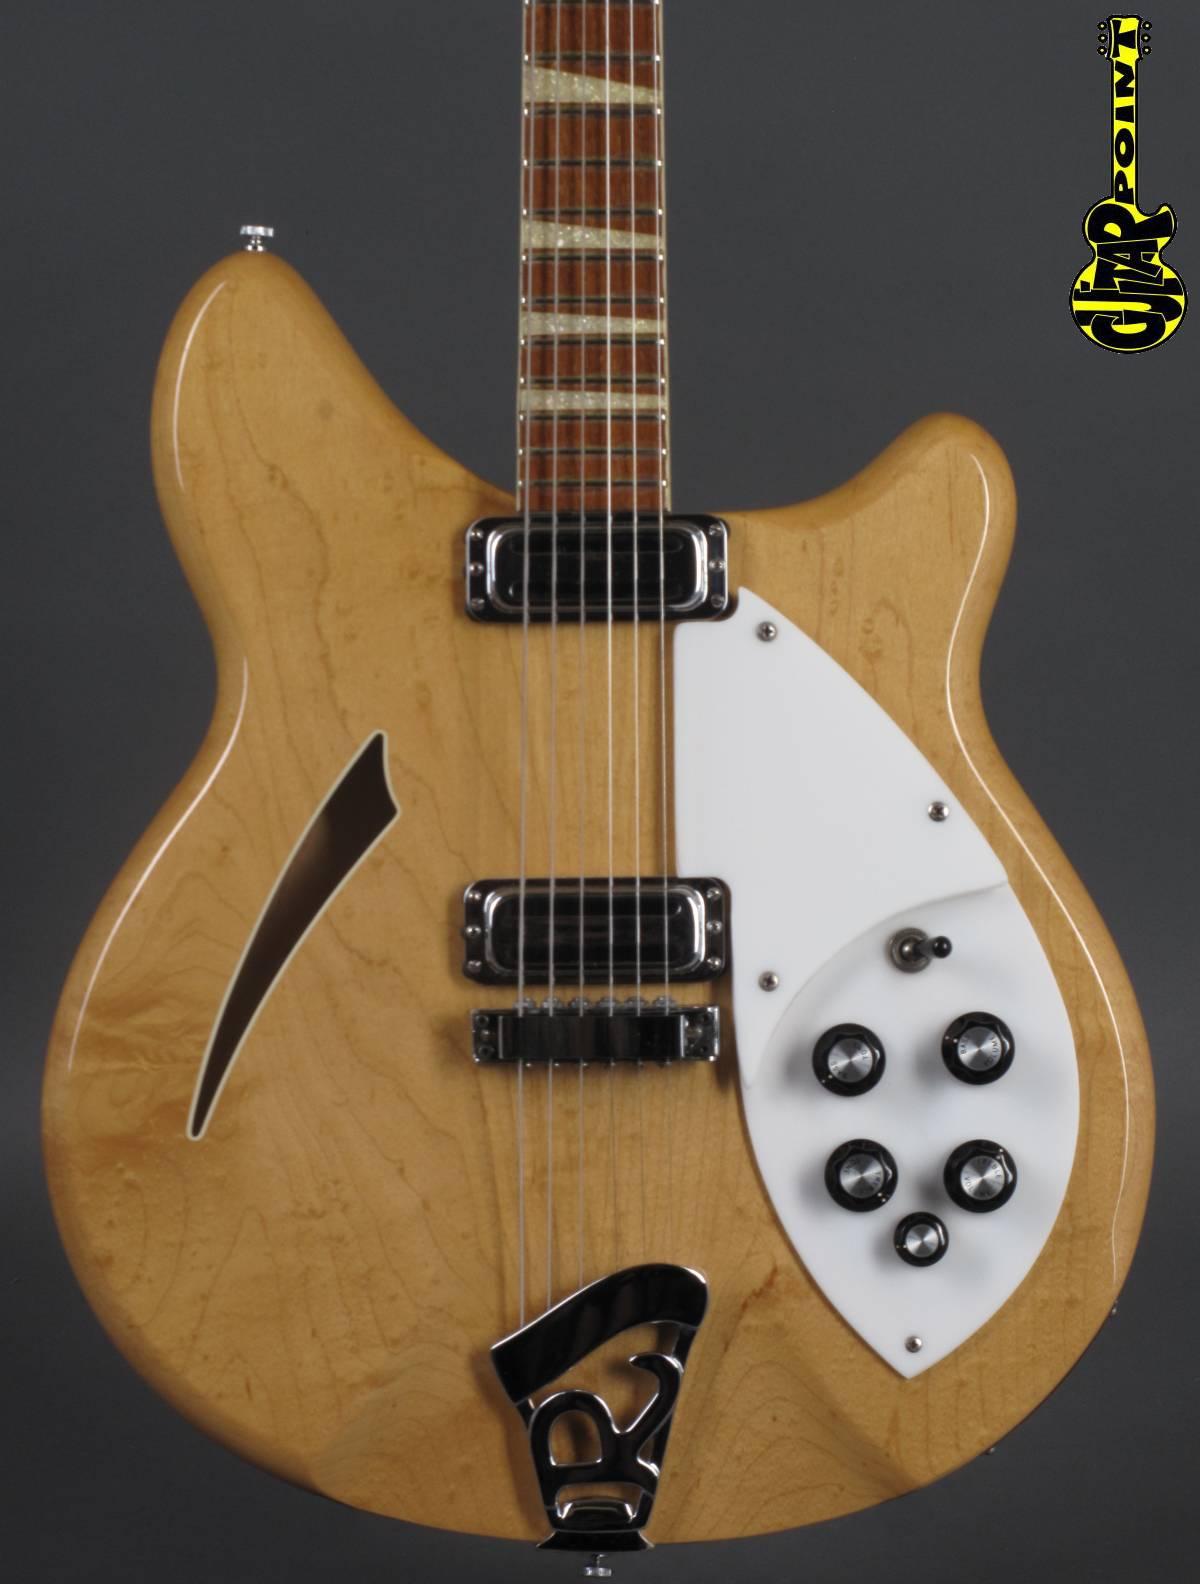 1966 Rickenbacker - 360 Mapleglow